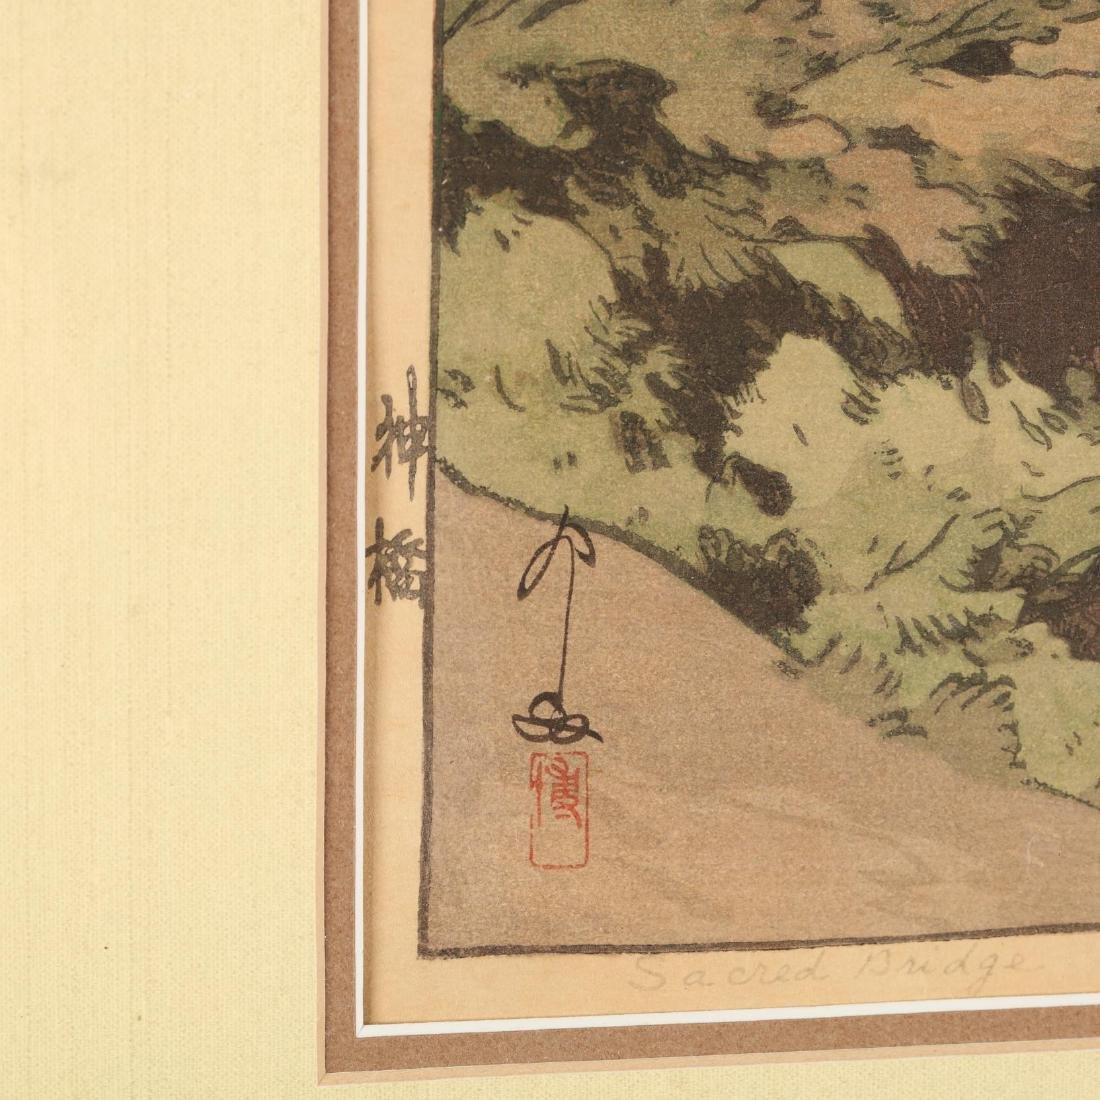 Three Japanese Woodblock Prints by Hiroshi Yoshida - 3